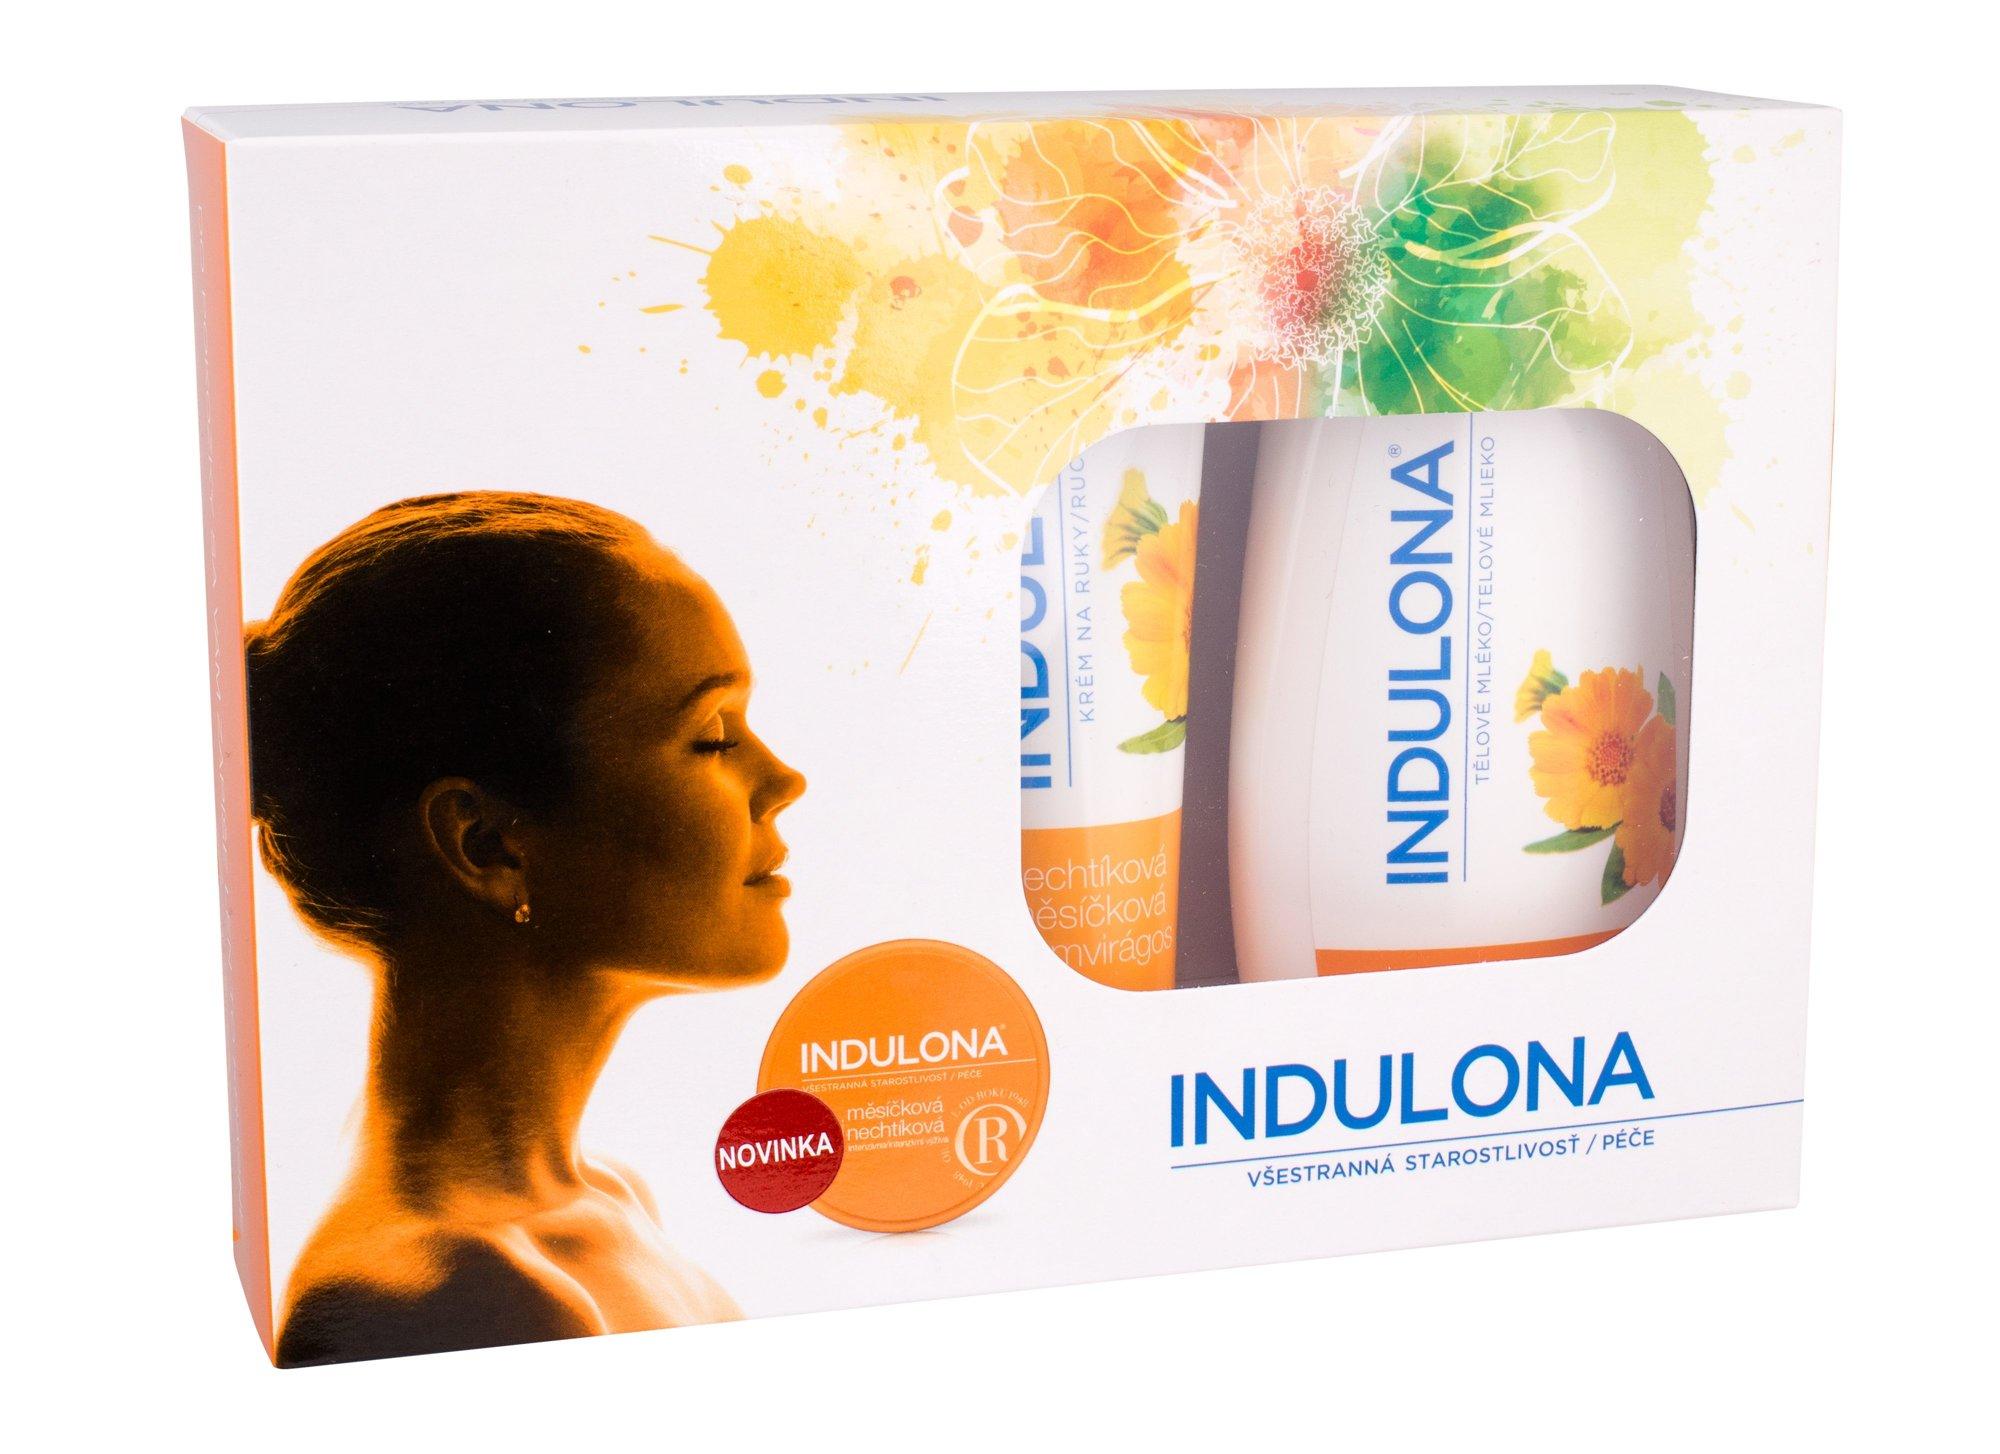 INDULONA Calendula Cosmetic 250ml